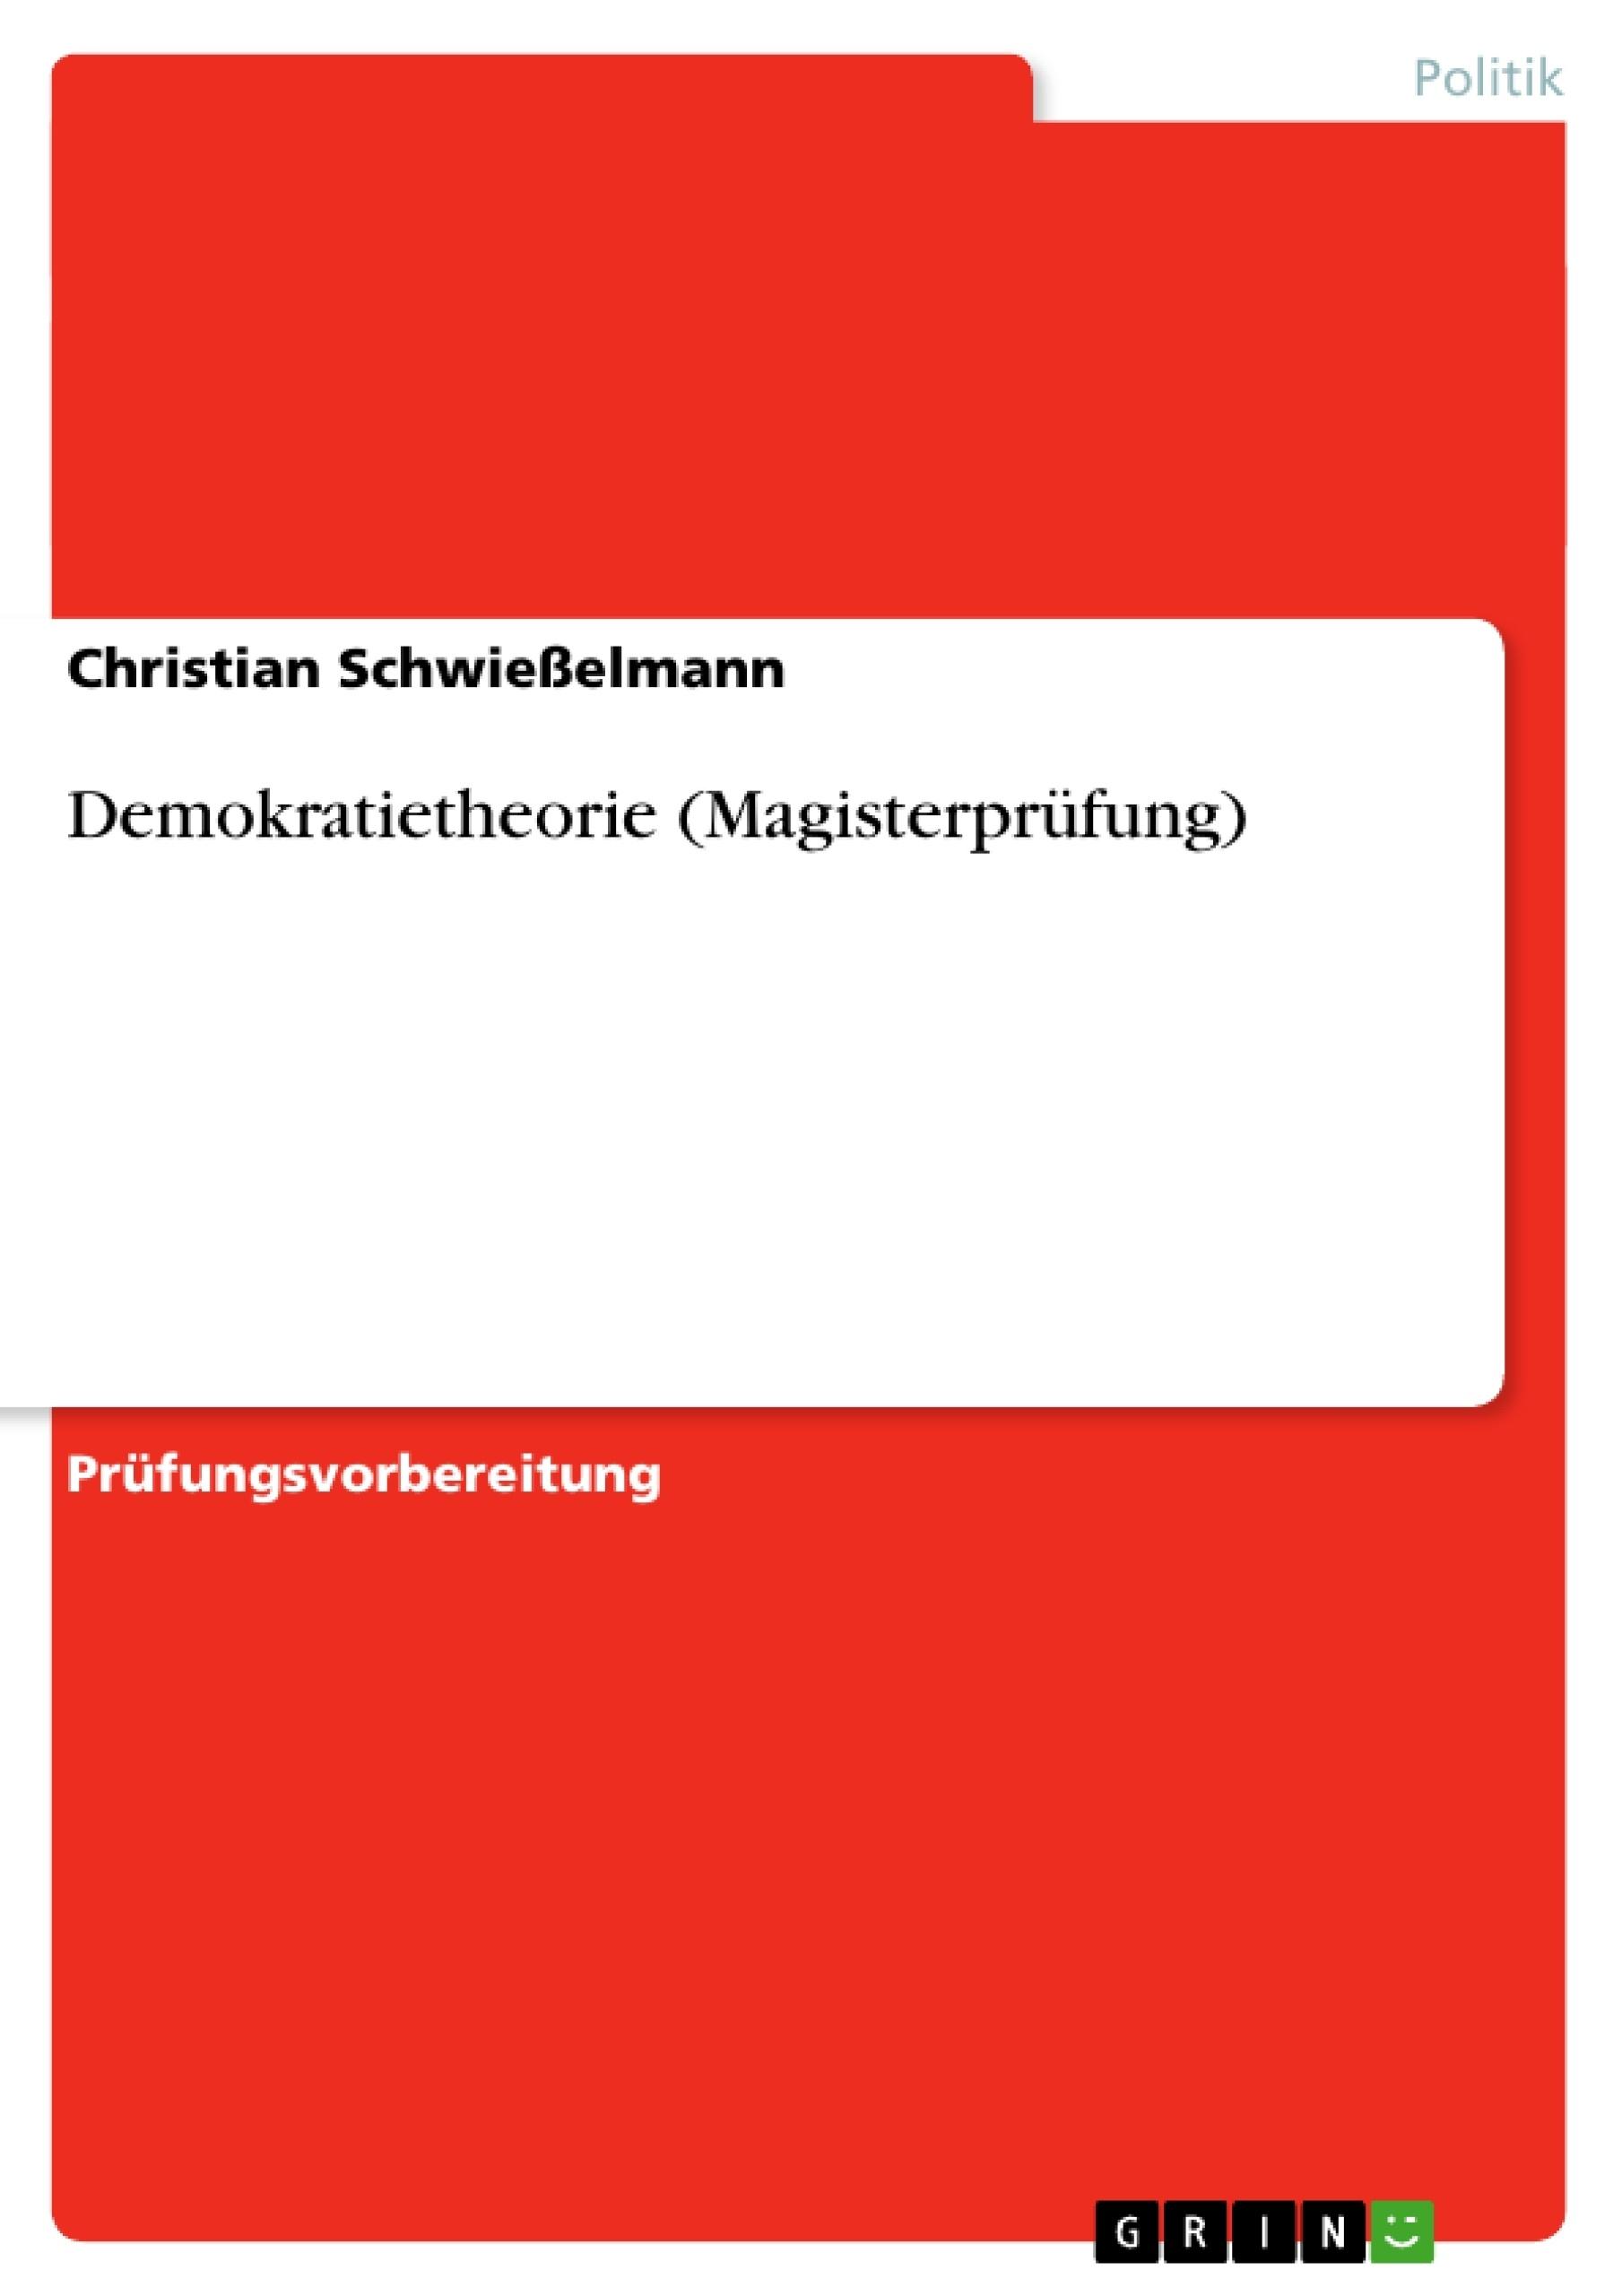 Titel: Demokratietheorie (Magisterprüfung)